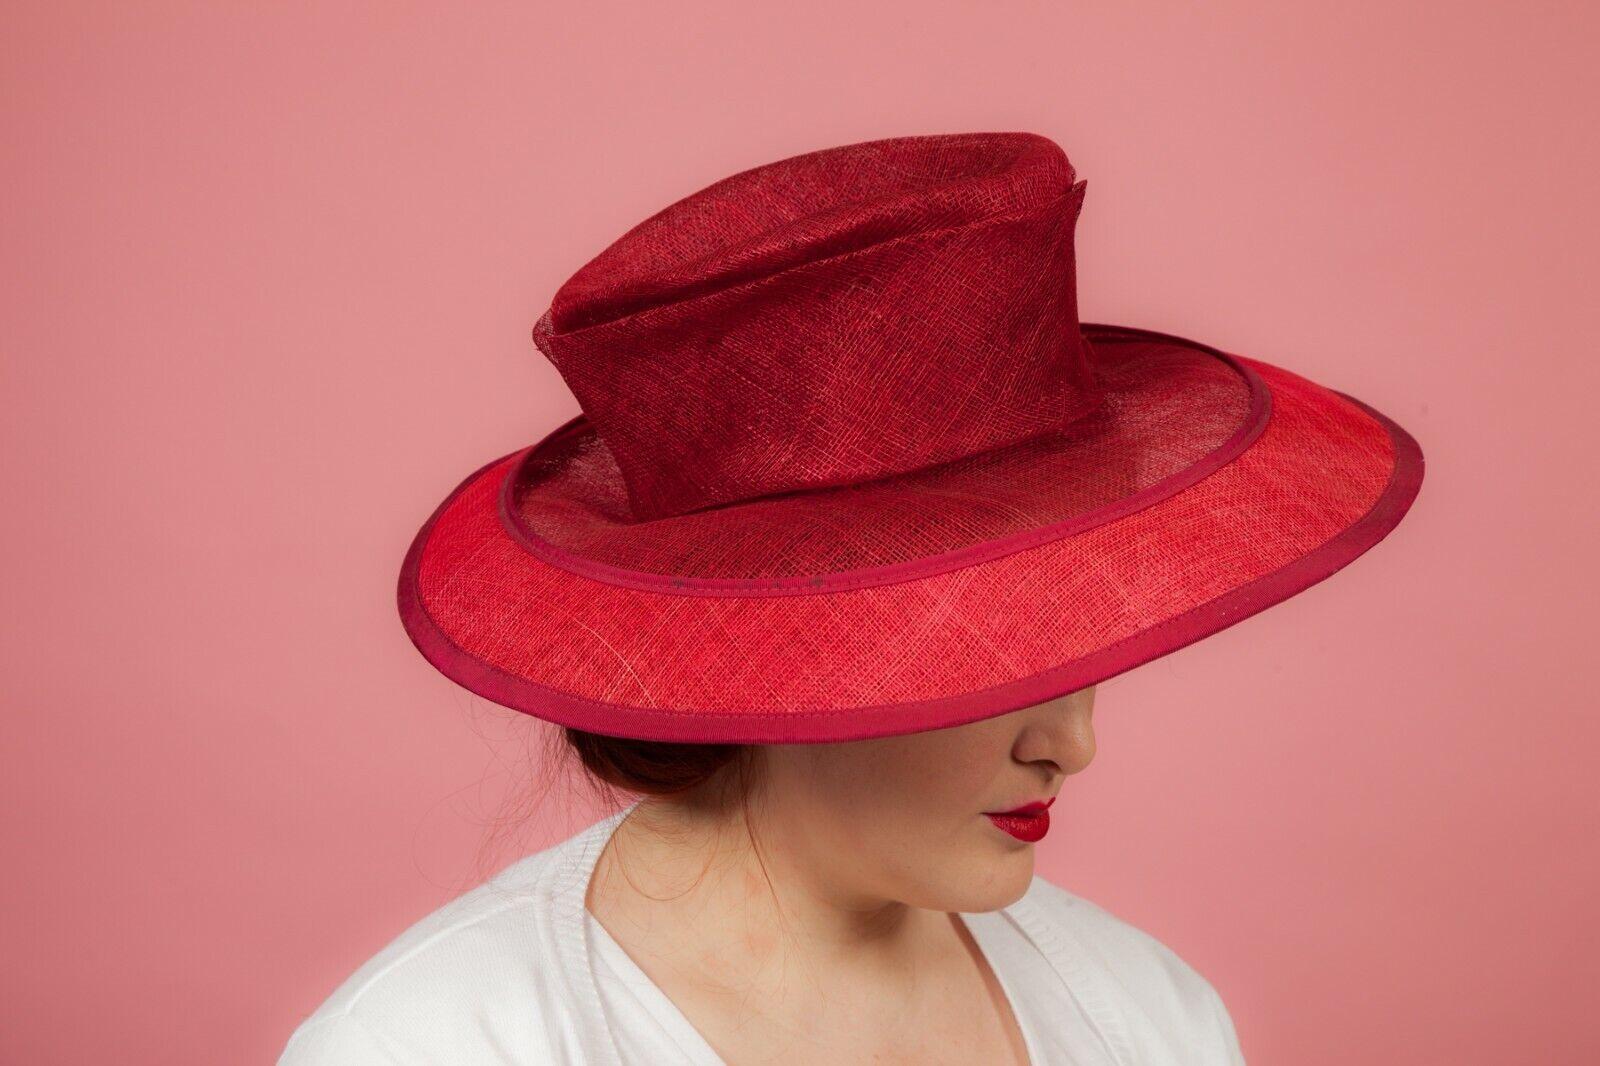 Large red formal hat by Pamela Bromley